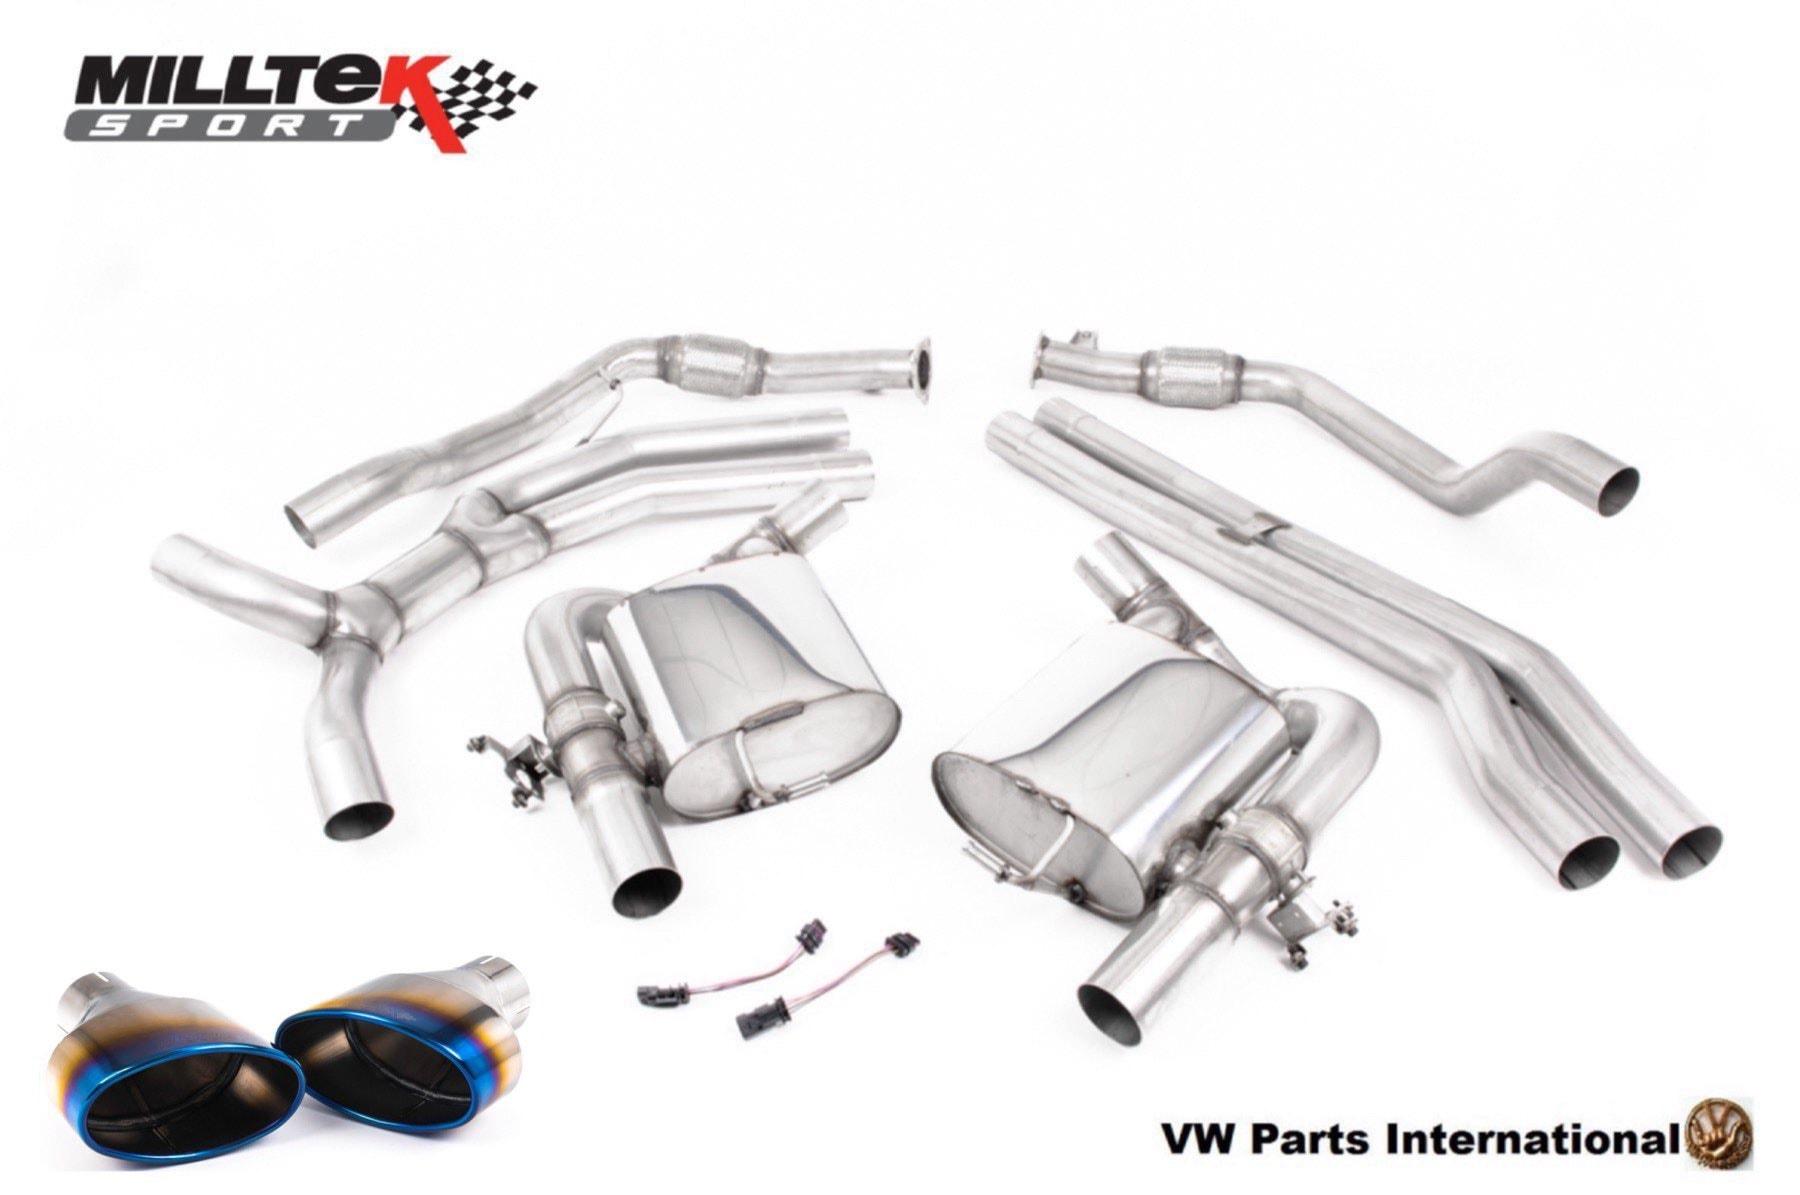 Audi RS4 RS5 quattro B9 2.9 V6 Turbo Milltek Sport Performance Non Resonated Cat Back Exhaust Burnt Titanium Oval Trims SSXAU832